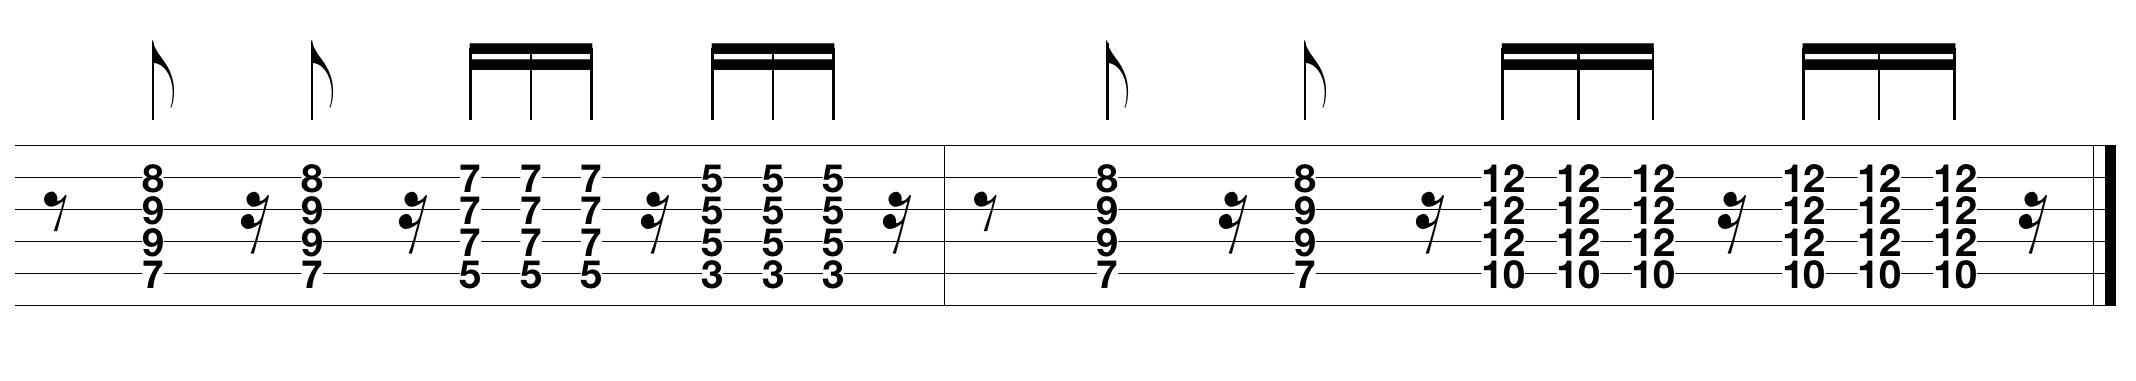 rhythm-guitar-library_3.png